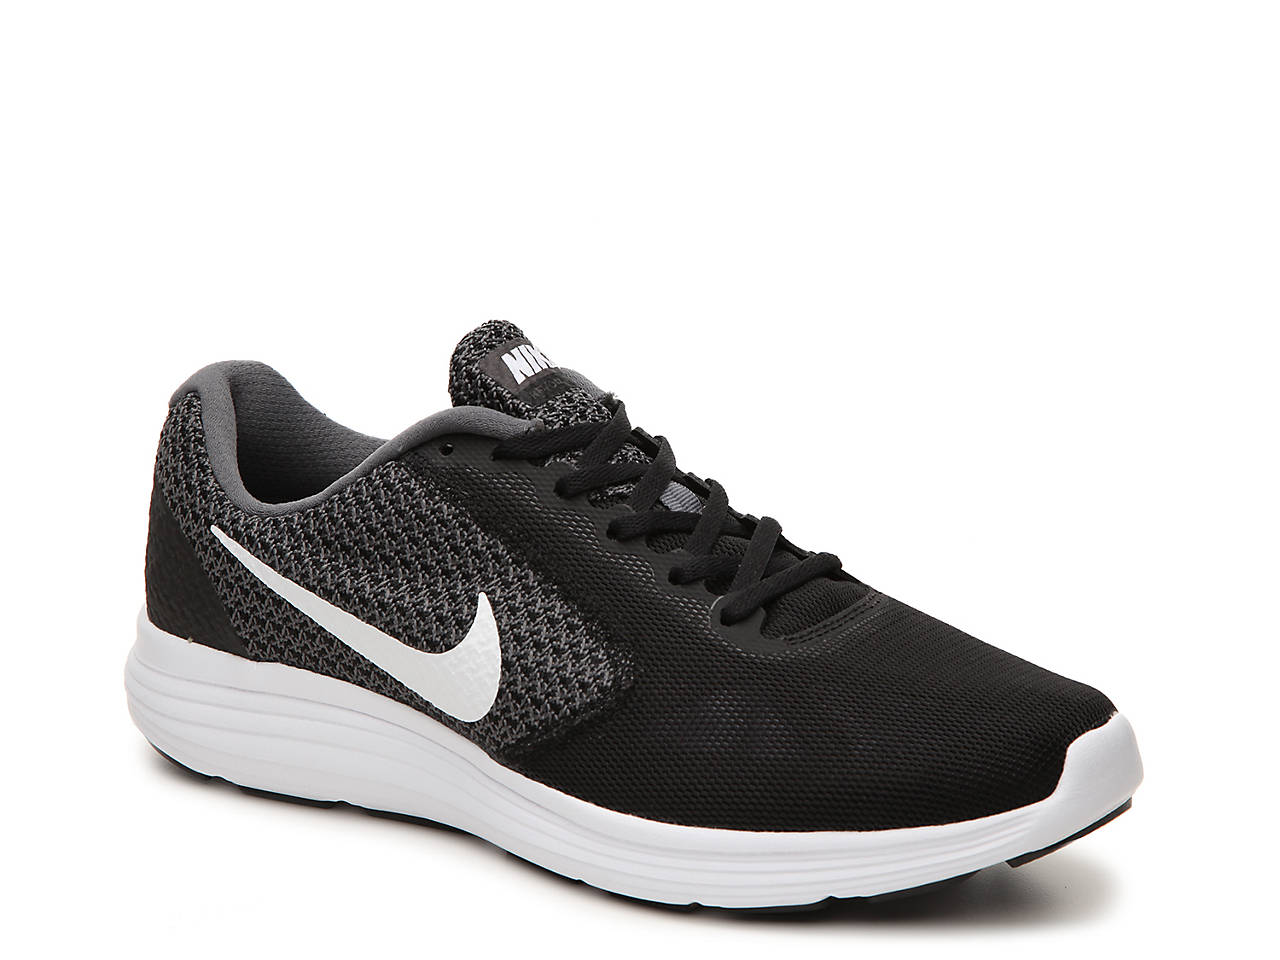 nike 3 revolution shoes